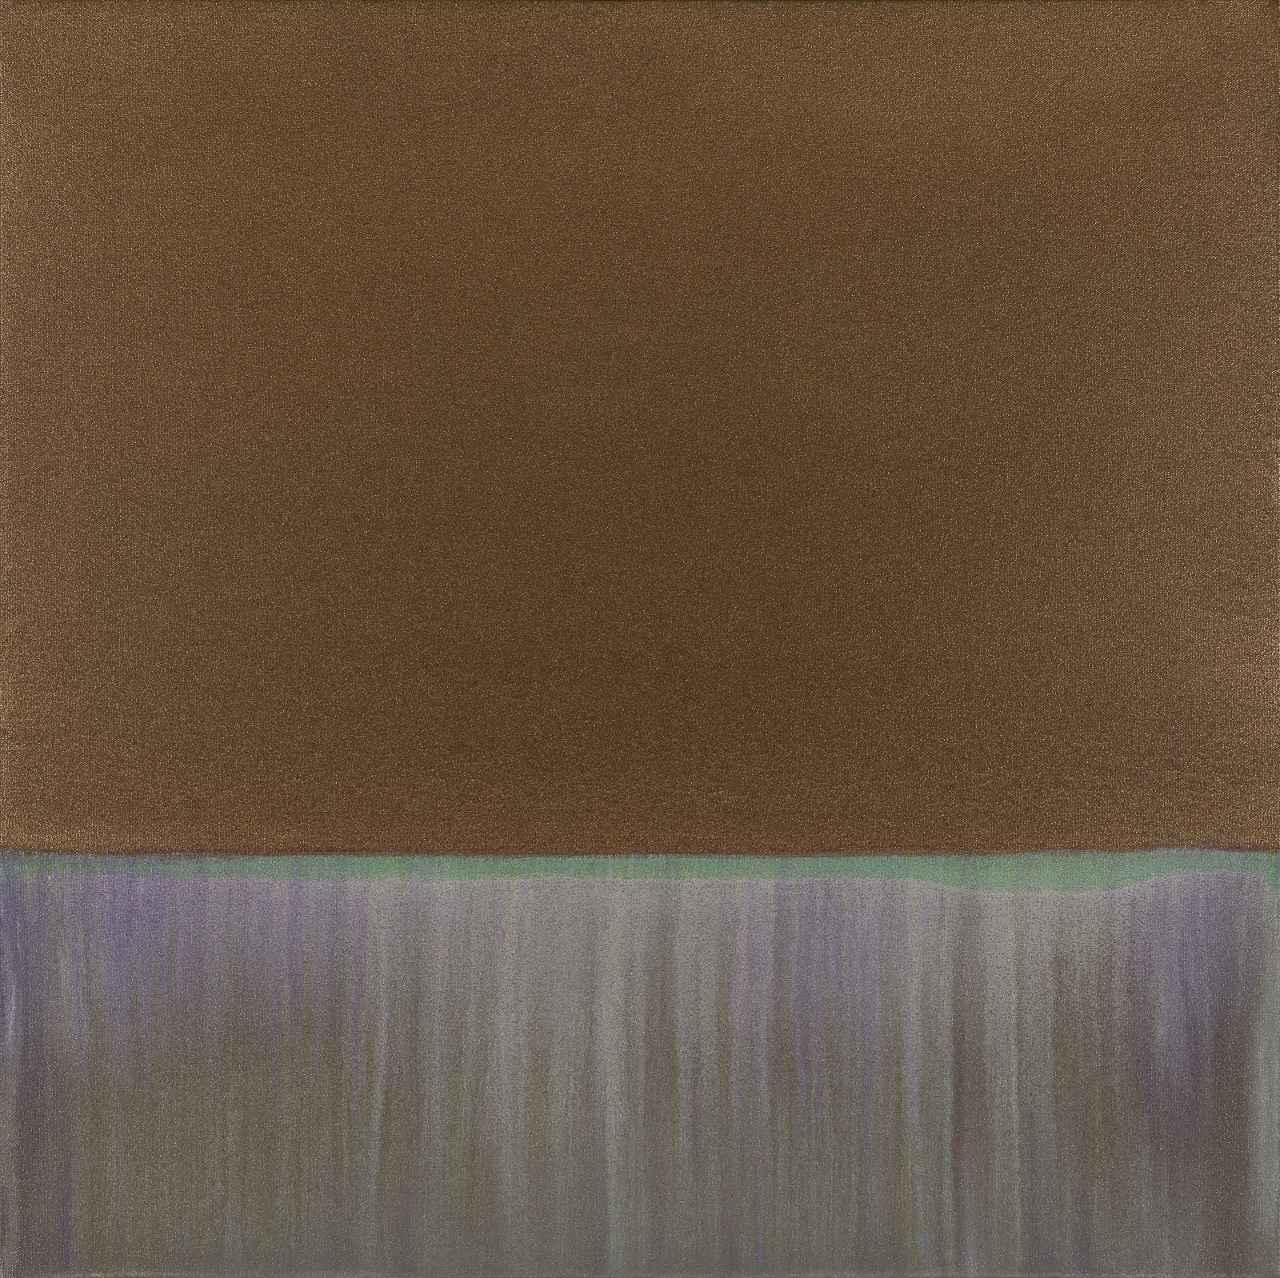 GRADIENT FLOW BRONZE by Mr. JUAN ALONSO-RODRIGUEZ - Masterpiece Online